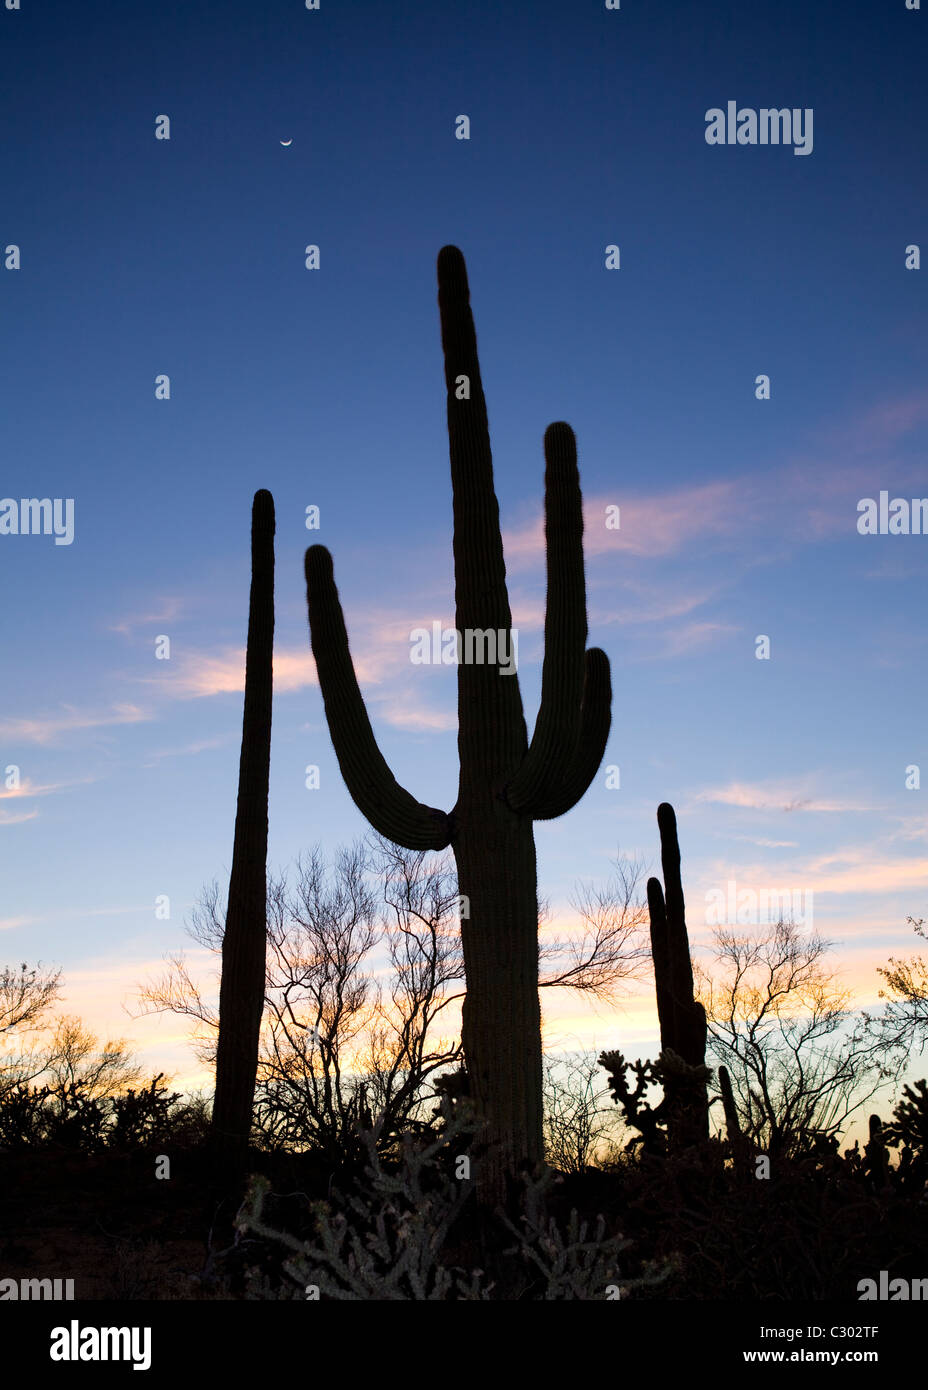 Saguaro-Kaktus-Feld - Saguaro National Park, Arizona USA Stockfoto